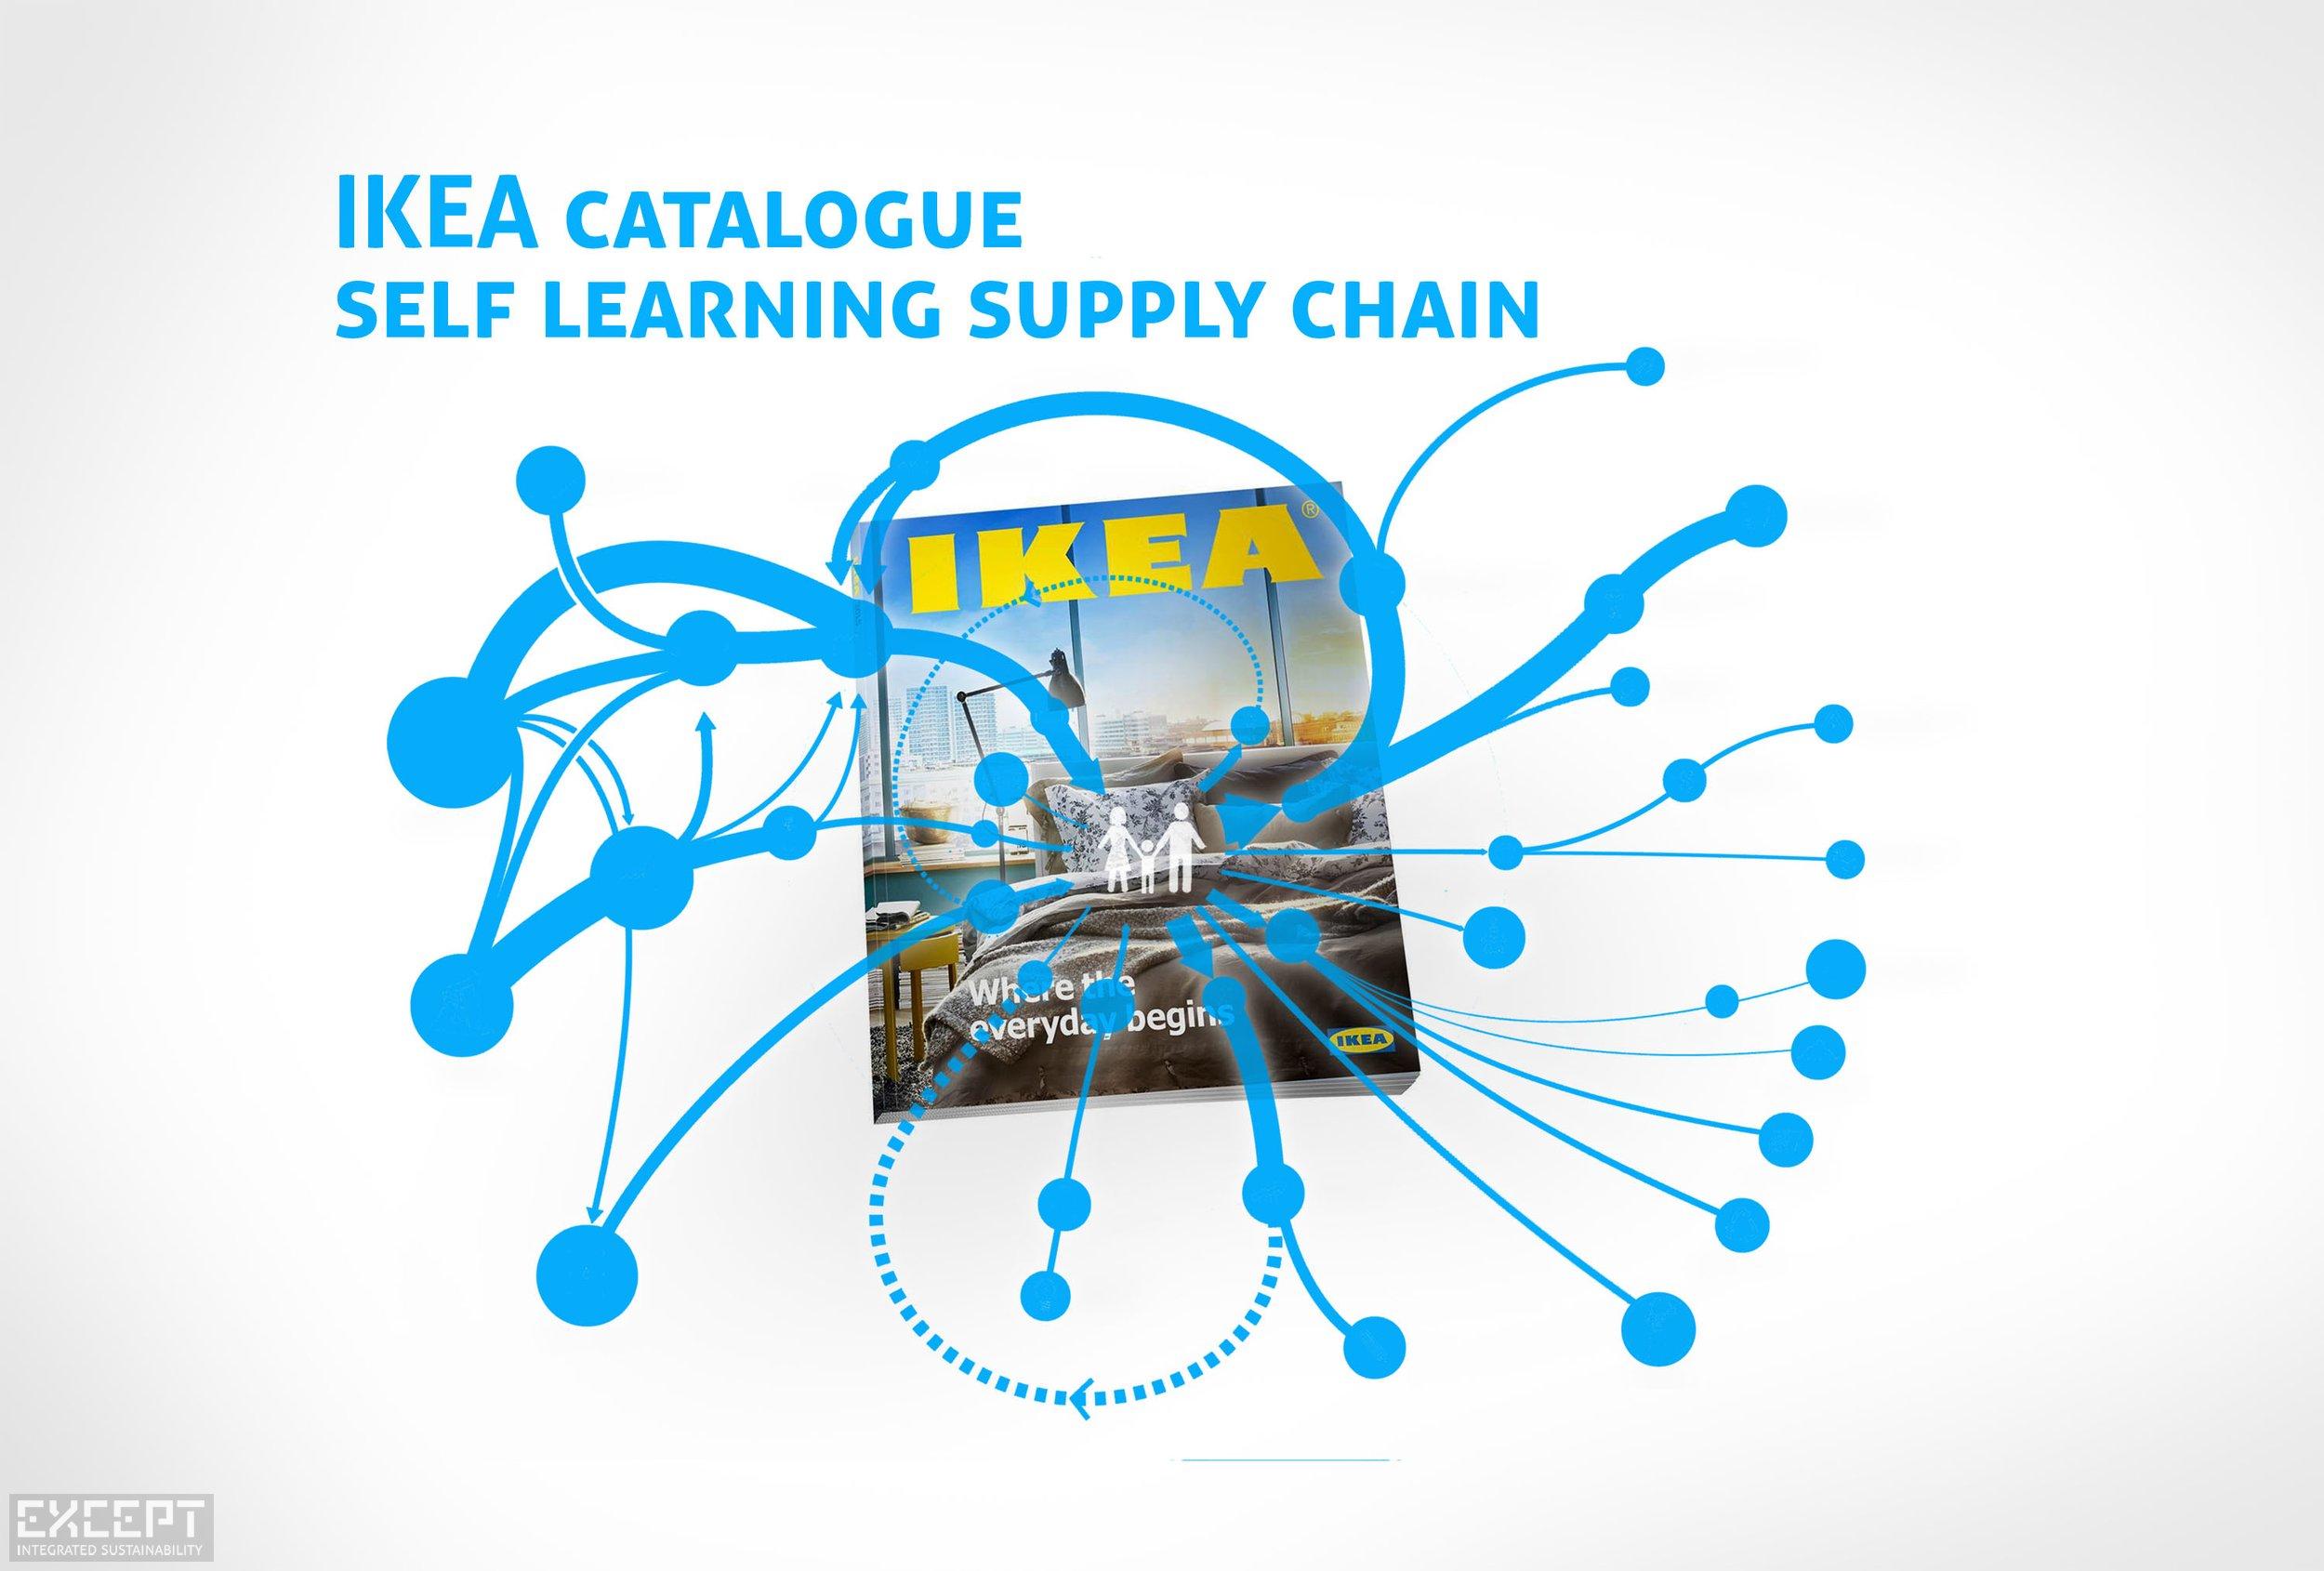 IKEA Supply Chain Case Study Essay